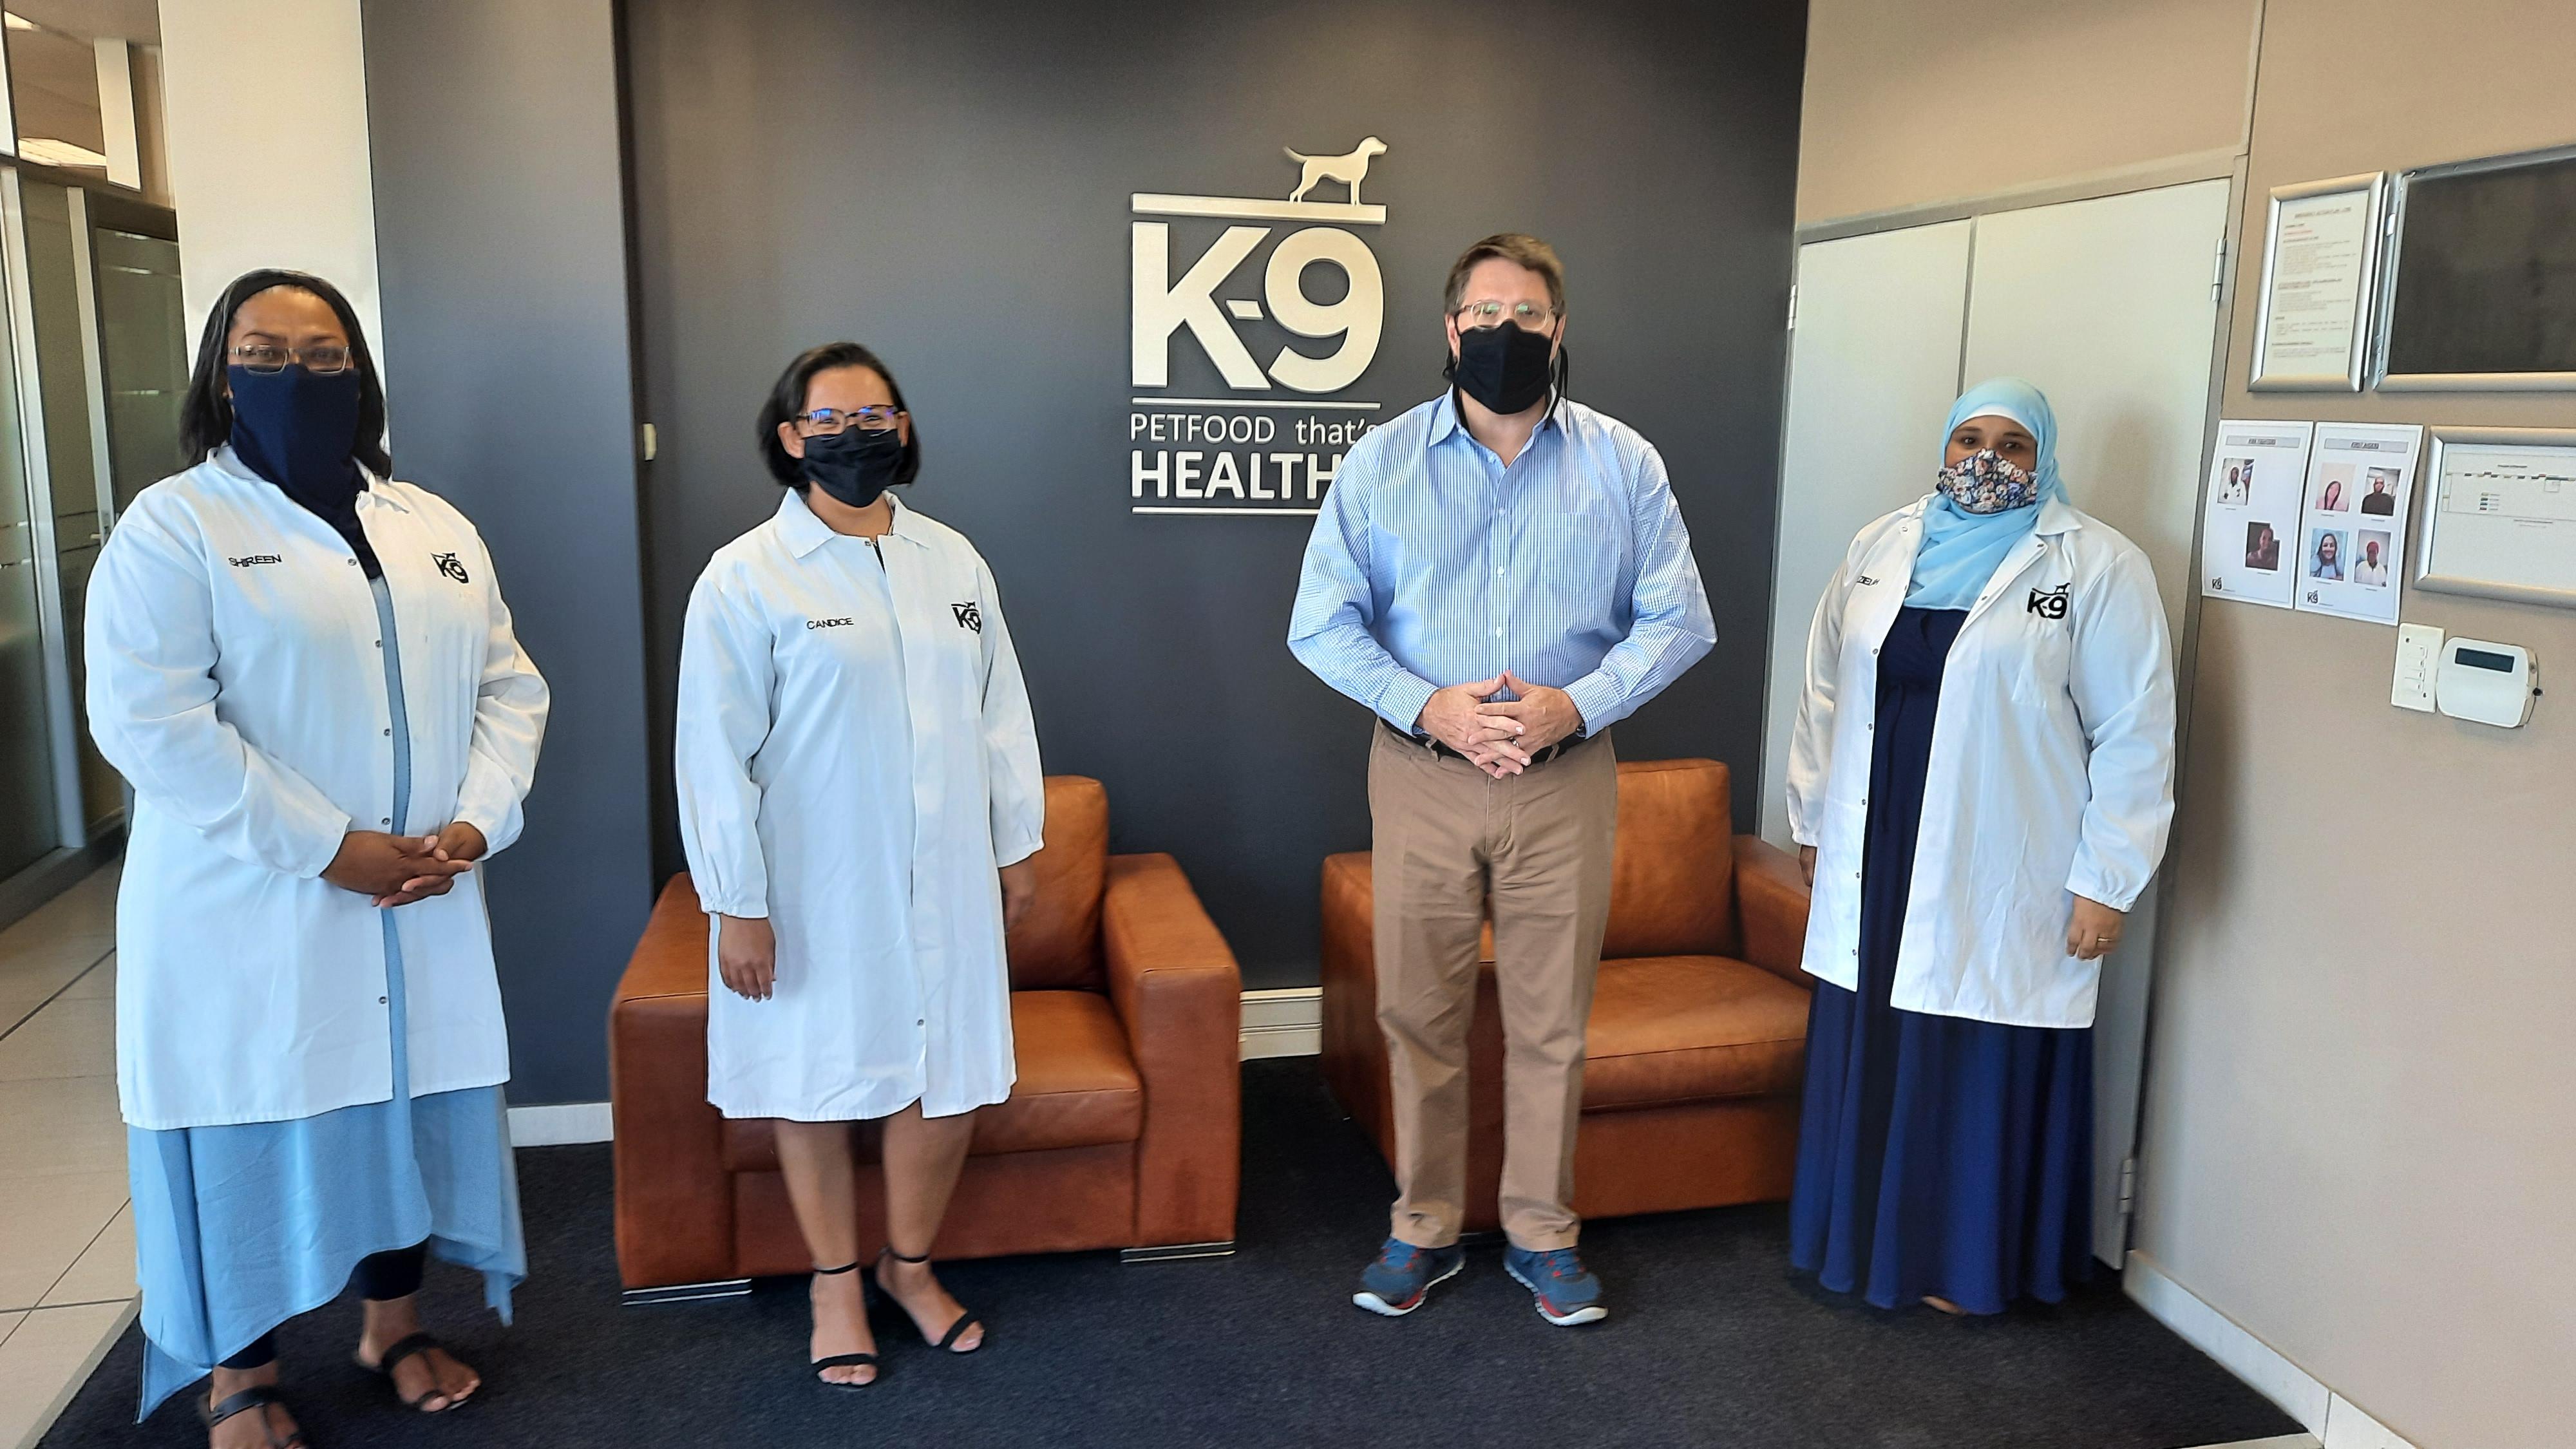 Minister Maynier visits K9 Petfoods